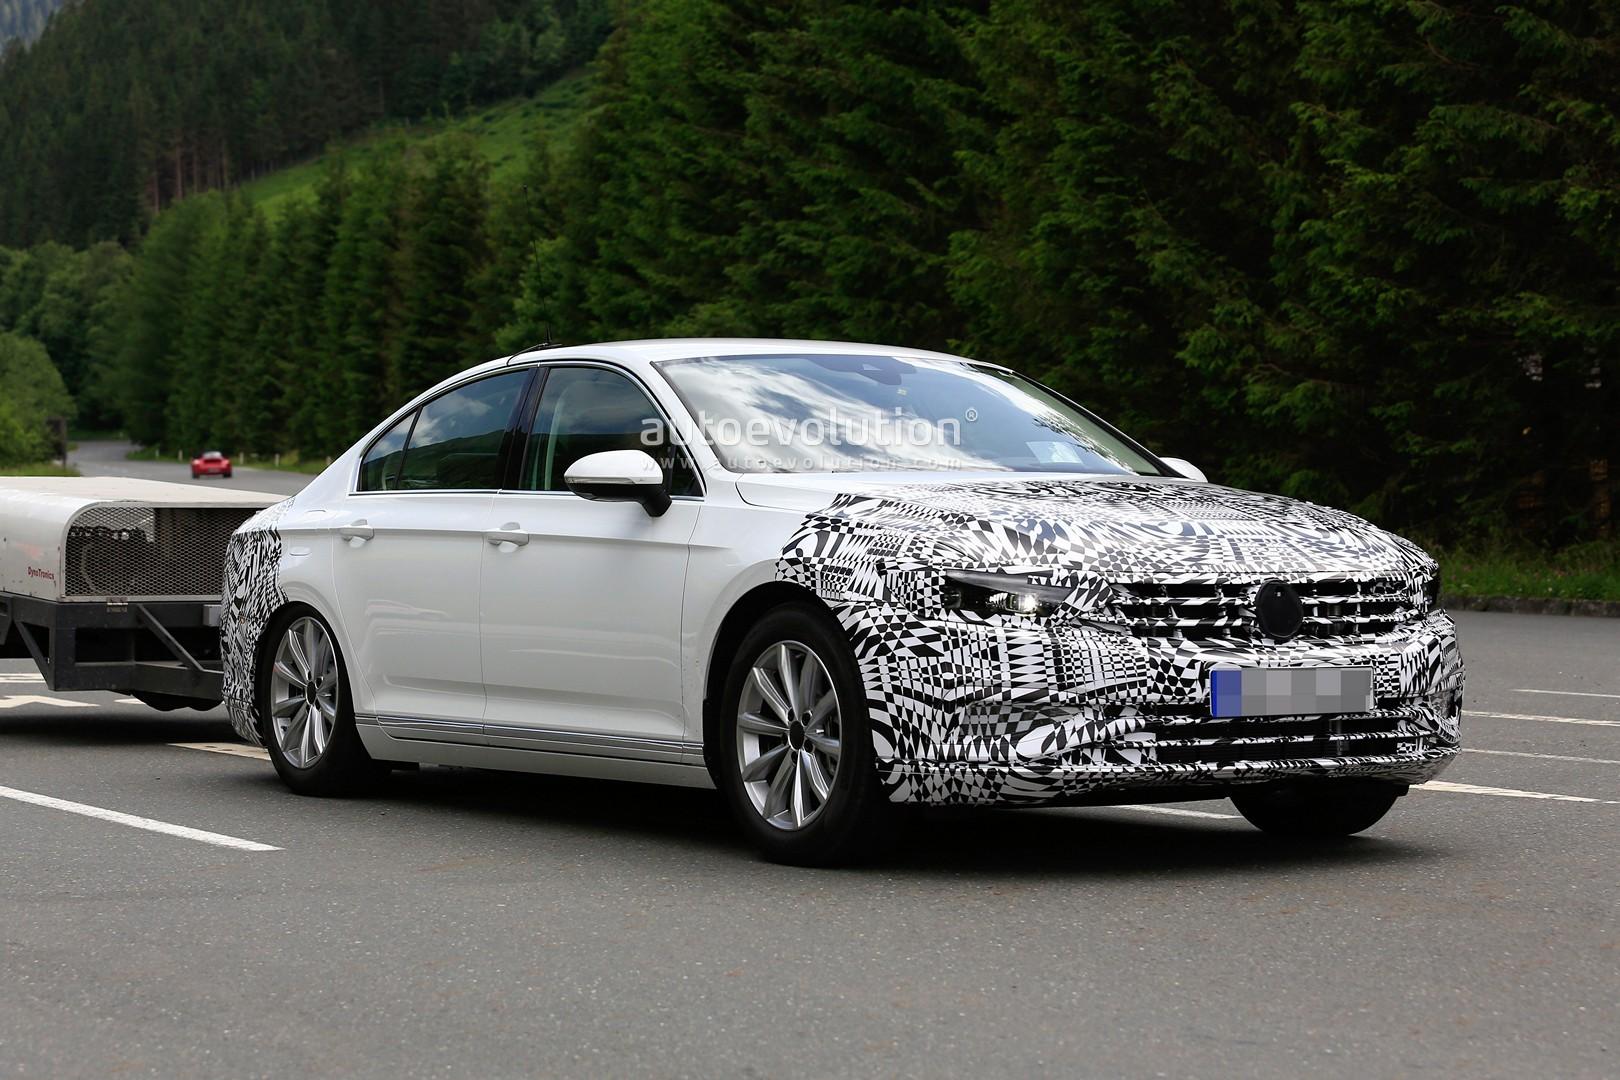 Spyshots: Volkswagen Passat 8.5 Facelift Starts Testing, Will Debut in 2018 - autoevolution